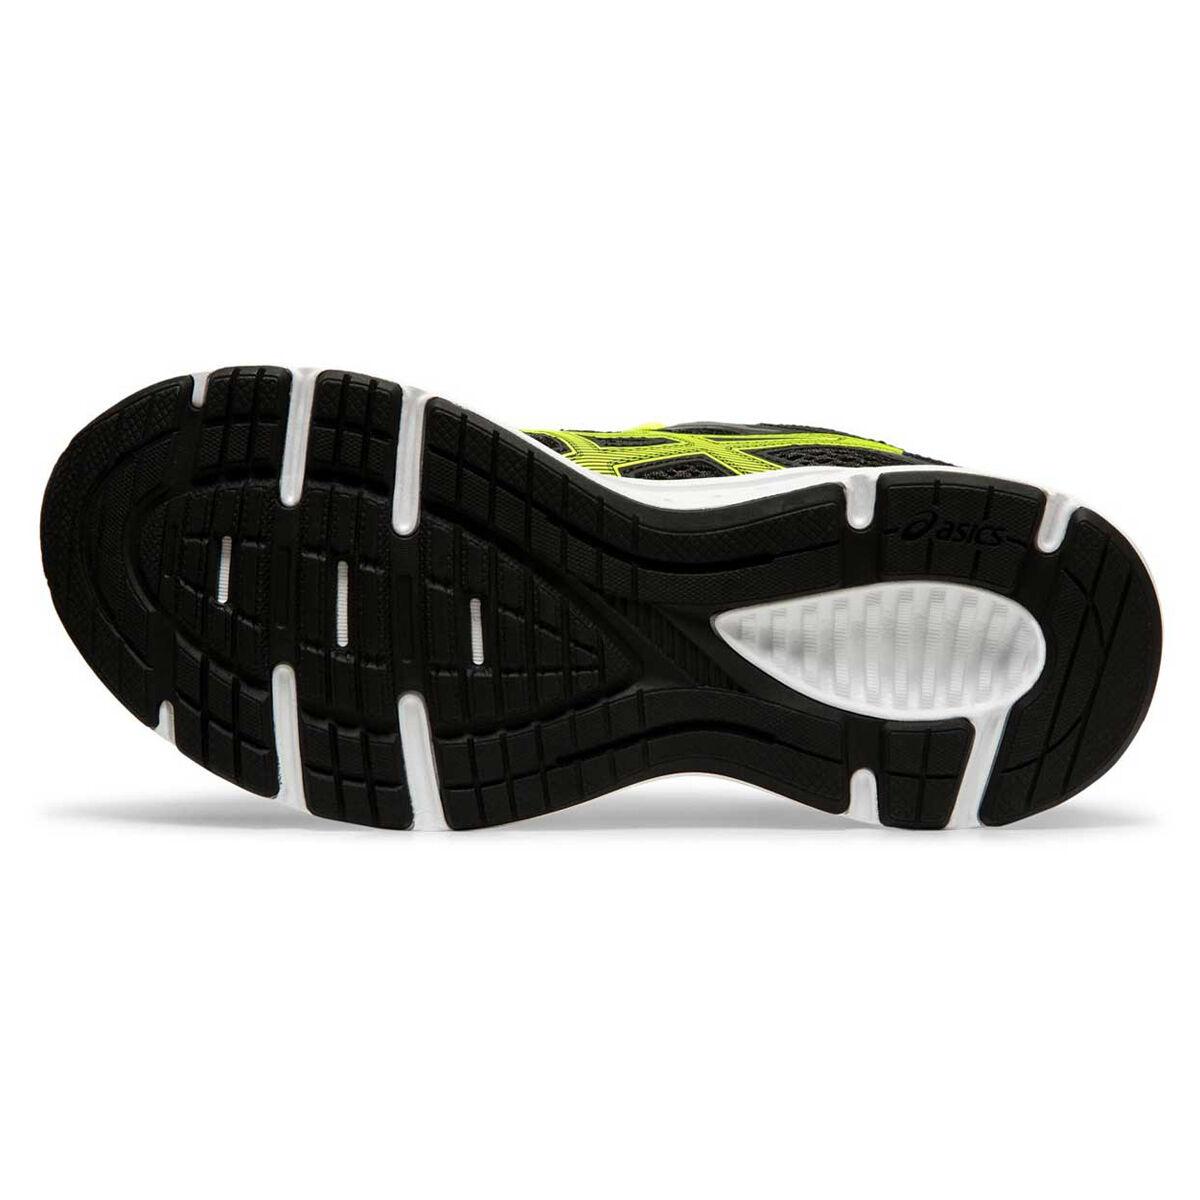 asics women's jolt walking shoes review orlando